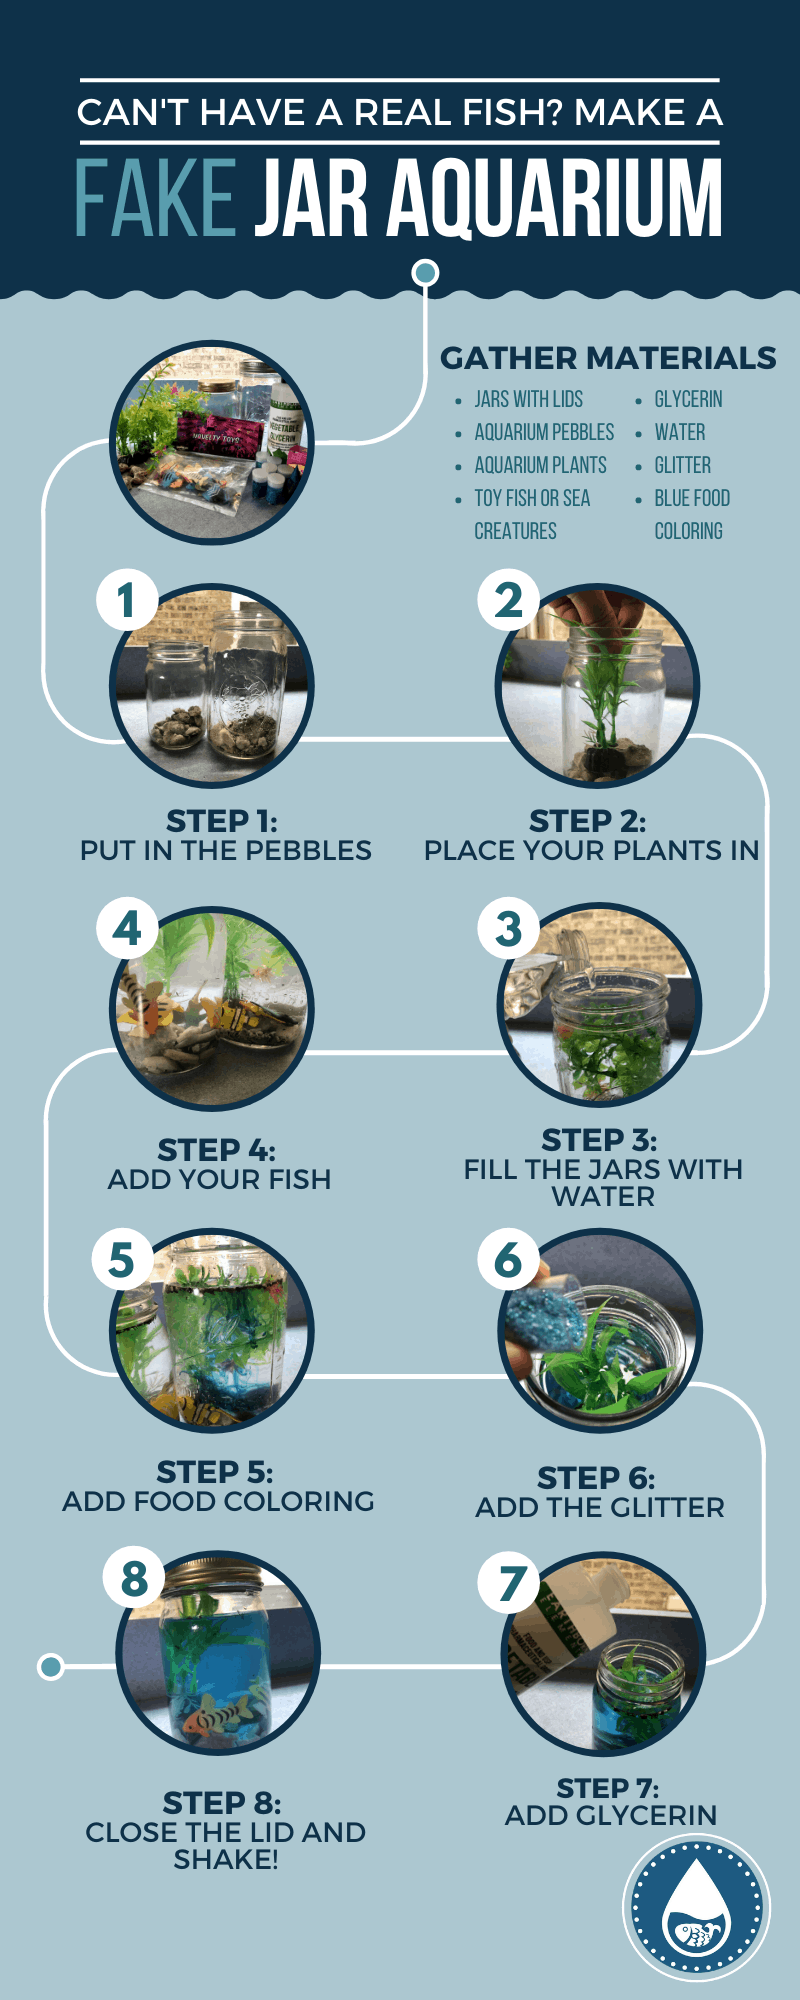 Can't Have Real Fish_ Make a Fake Jar Aquarium - Infographic